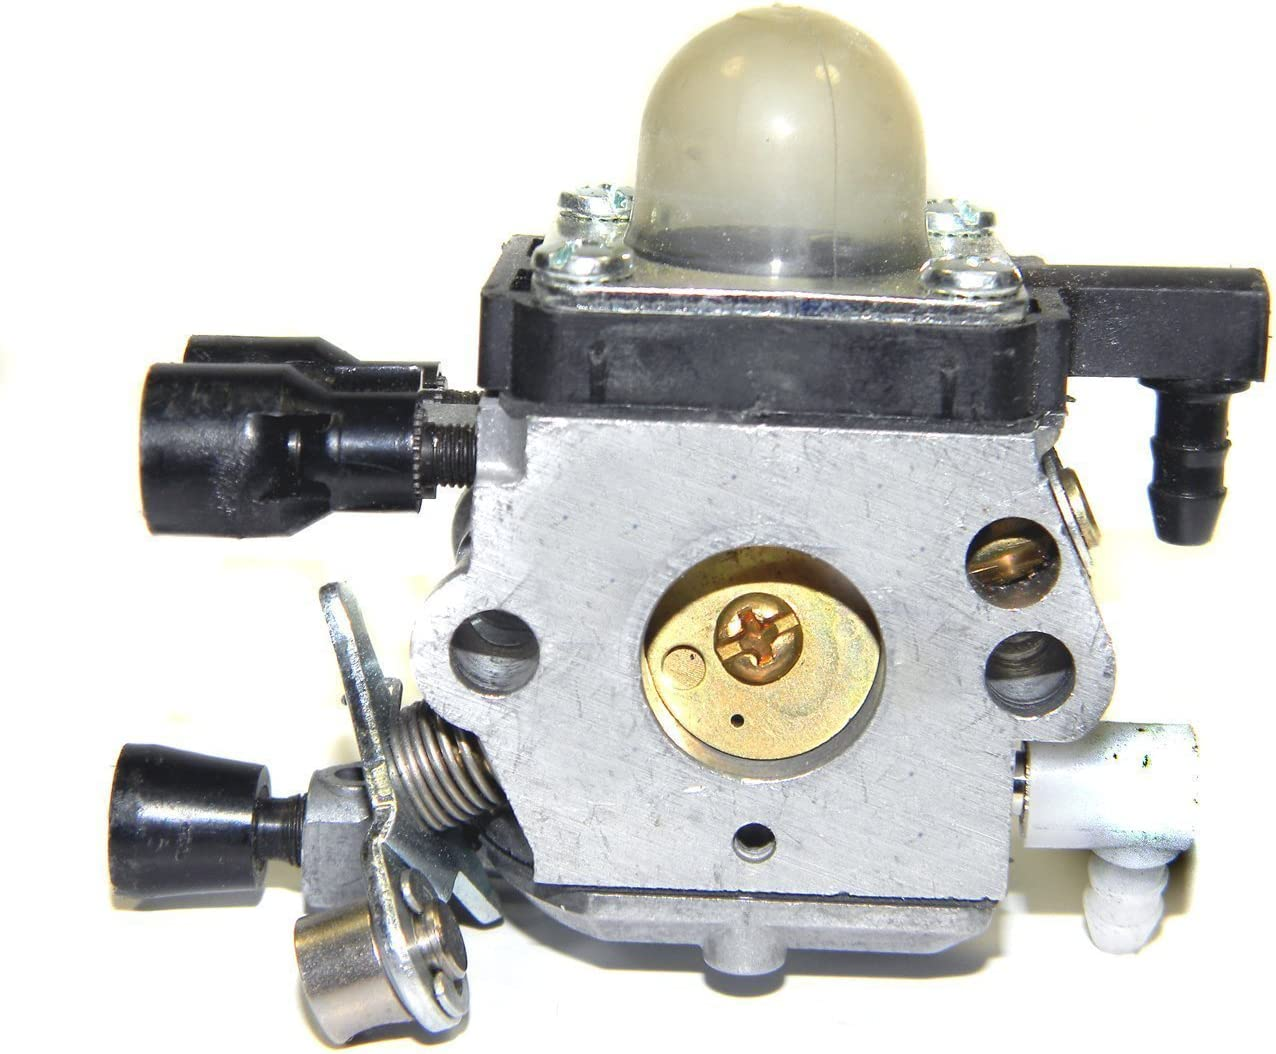 Carburetor Kit for STIHL FS38 FS45 FS55 FS74 FS75 FS76 FS80 String Trimmer